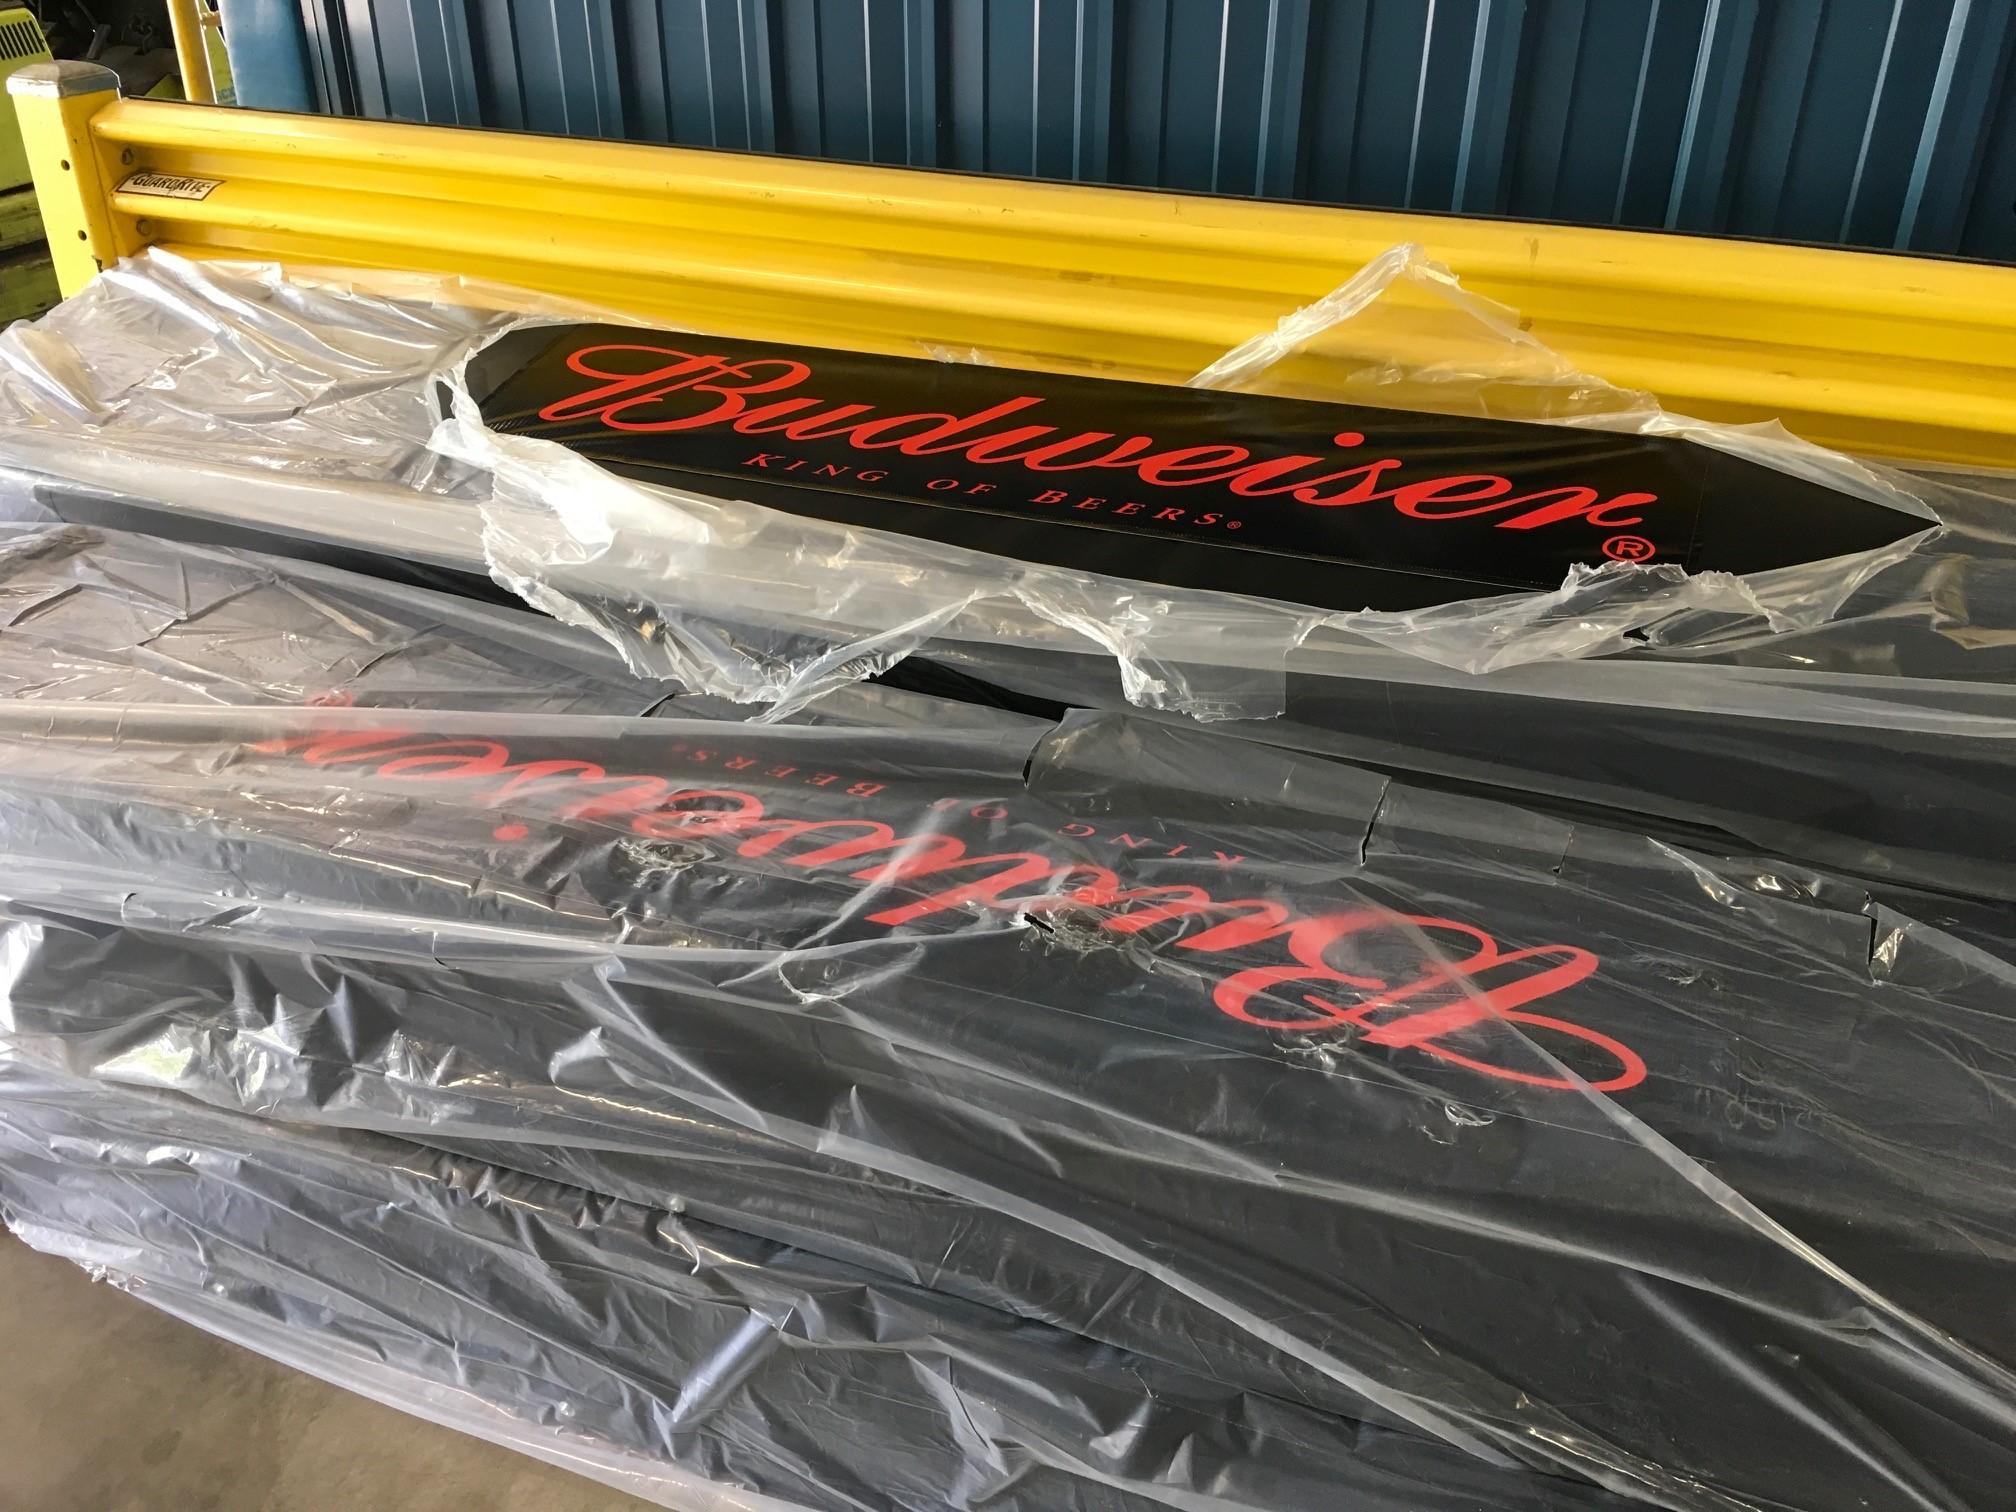 Custom Dock Seals for Loading Dock Bumpers Cushions Pads Rice Equipment Saint Louis STL Missouri Illinios.jpg